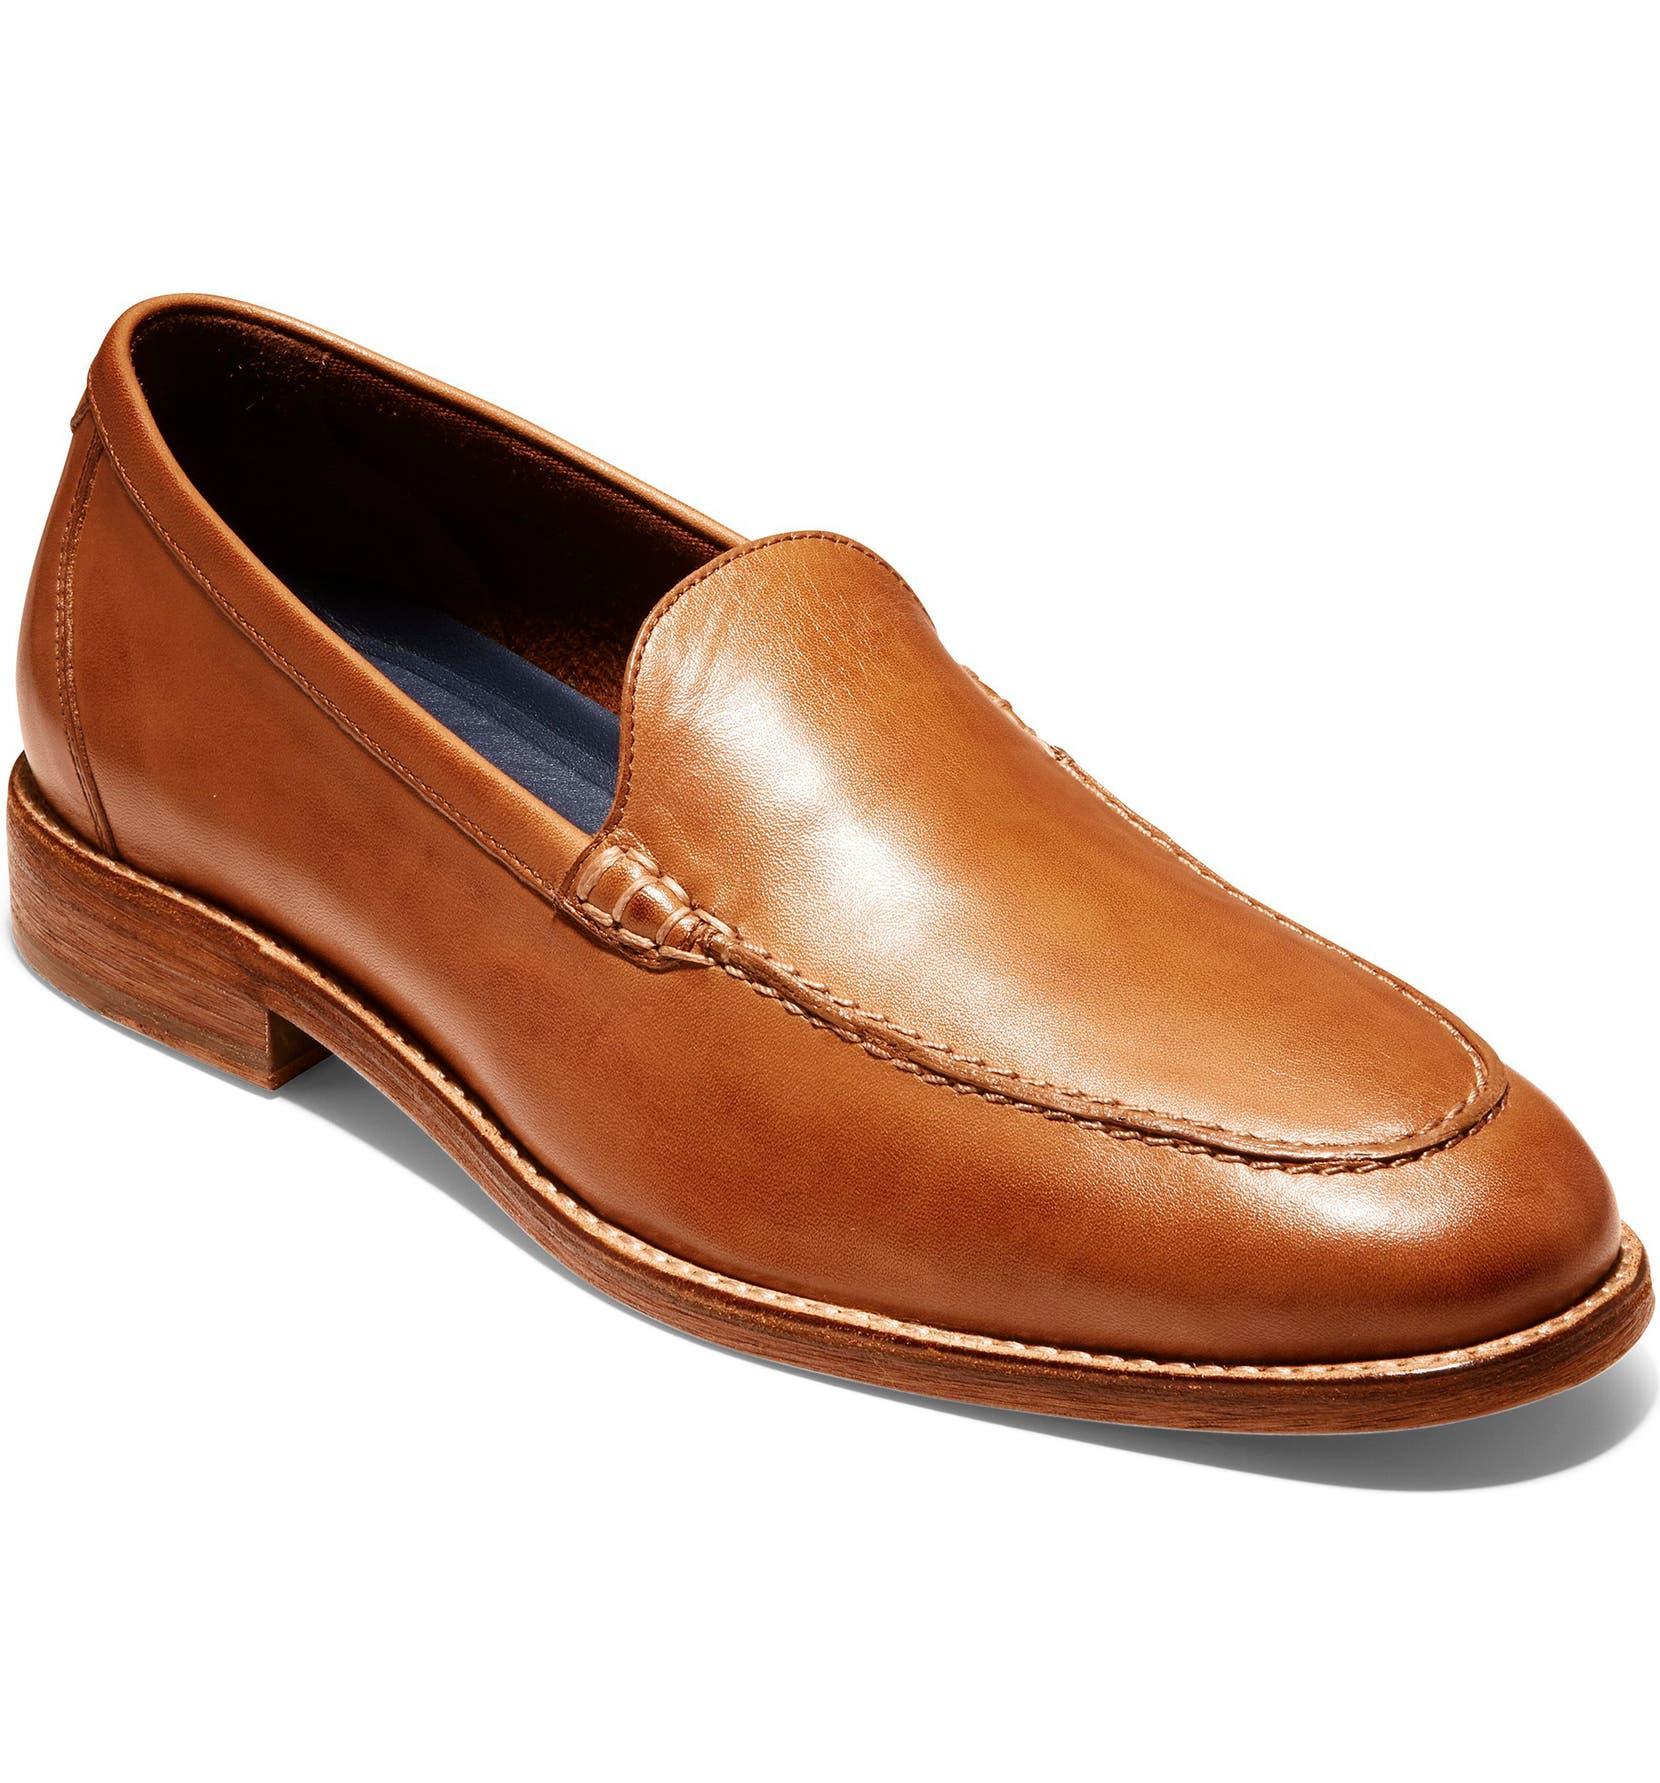 98dd91666 Cole Haan Feathercraft Grand Venetian Loafer (Men)   Nordstrom